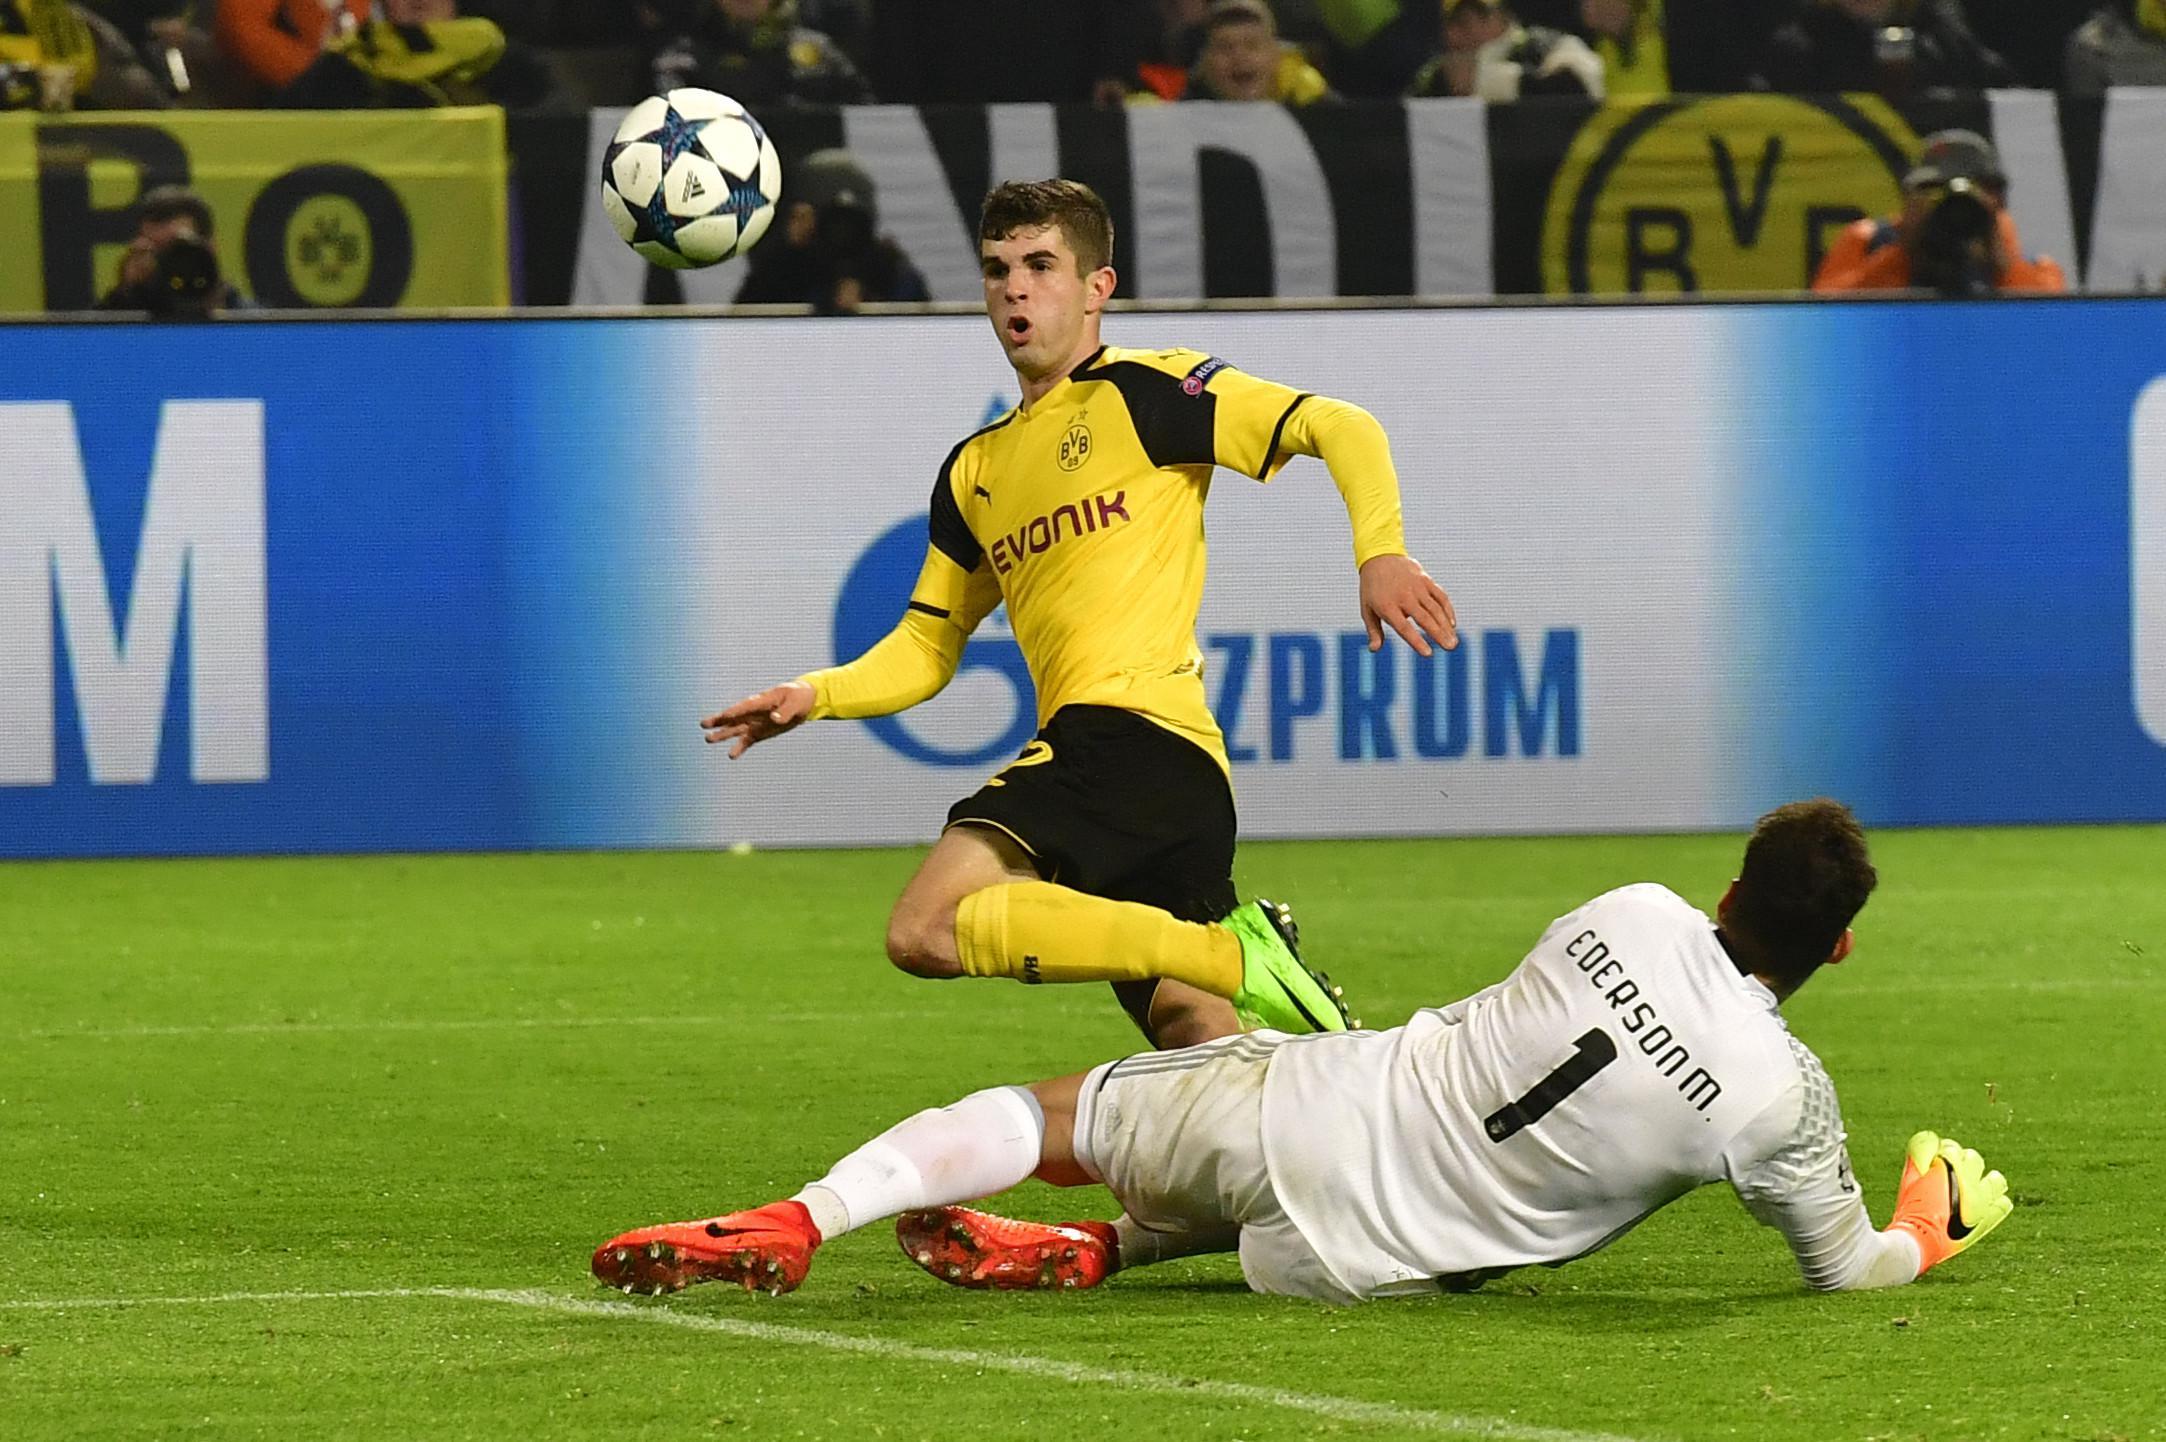 Gelandang Borussia Dortmund, Christian Pulisic (AFP)